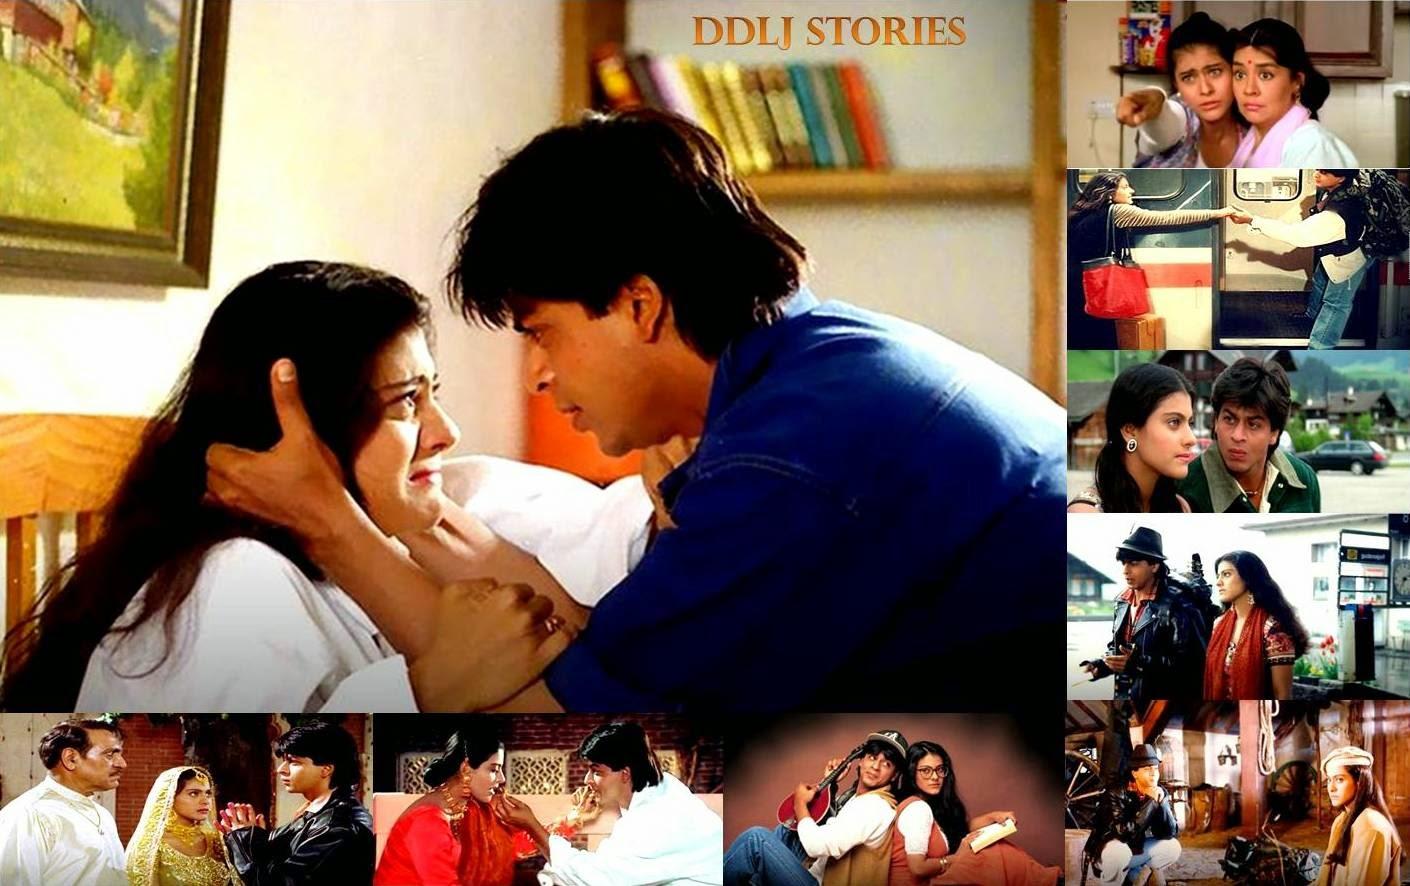 Shahrukh Khan Kajol stills of Dilwale Dulhania le Jayenge and behind the scene stories